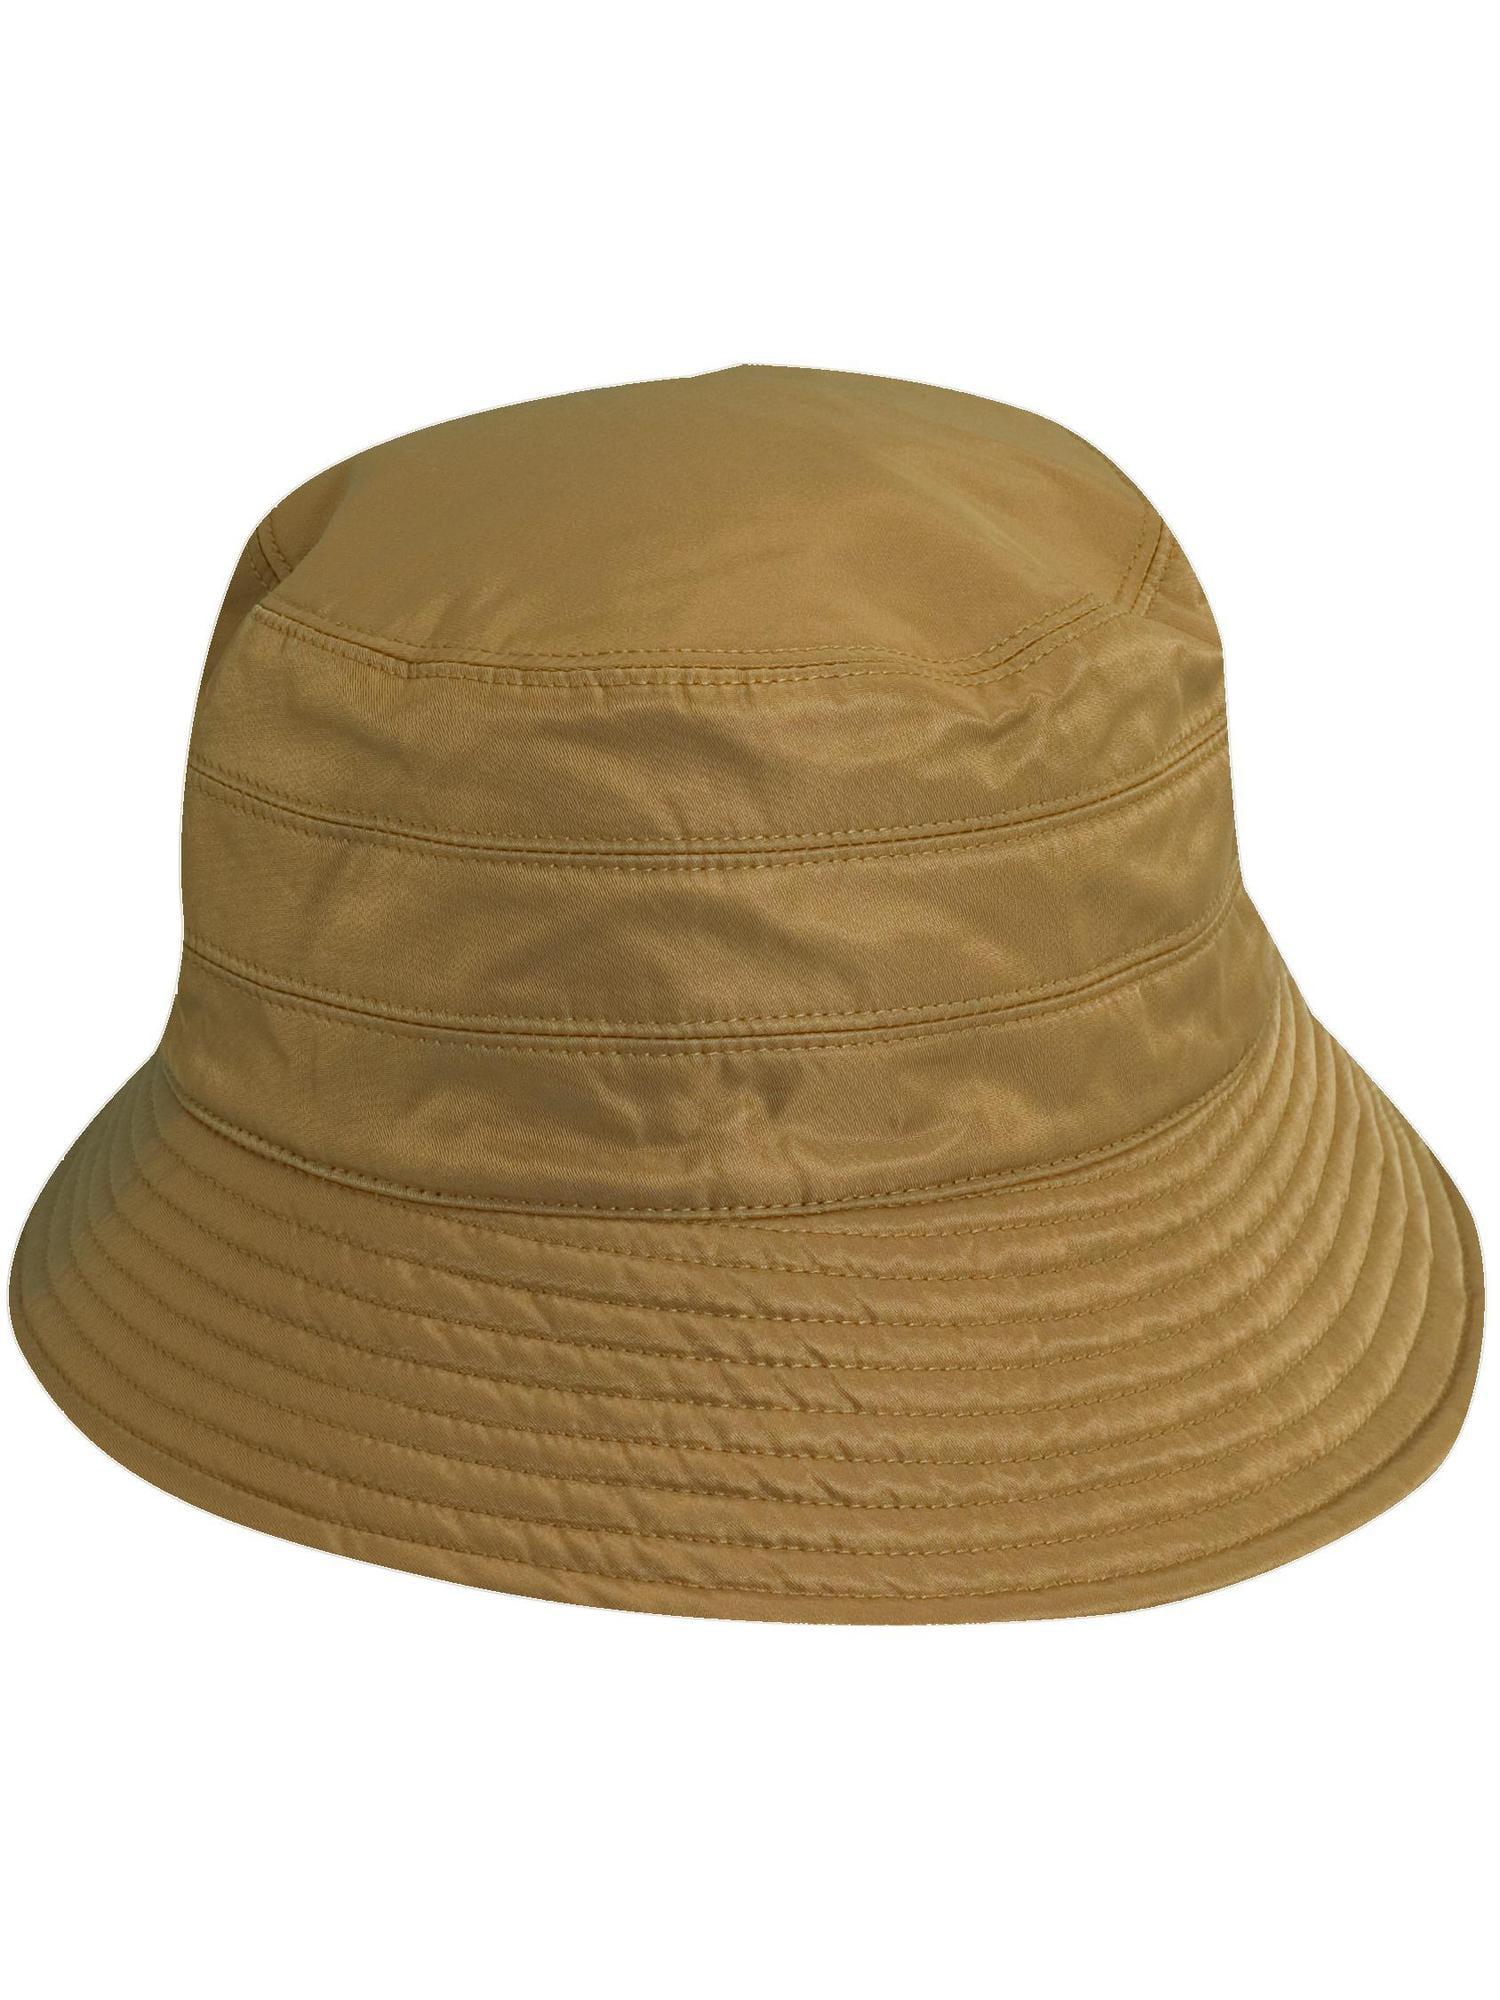 Charcoal One Size Scala Classico Womens Waterproof 3 Inch Brim Lined Rain Hat